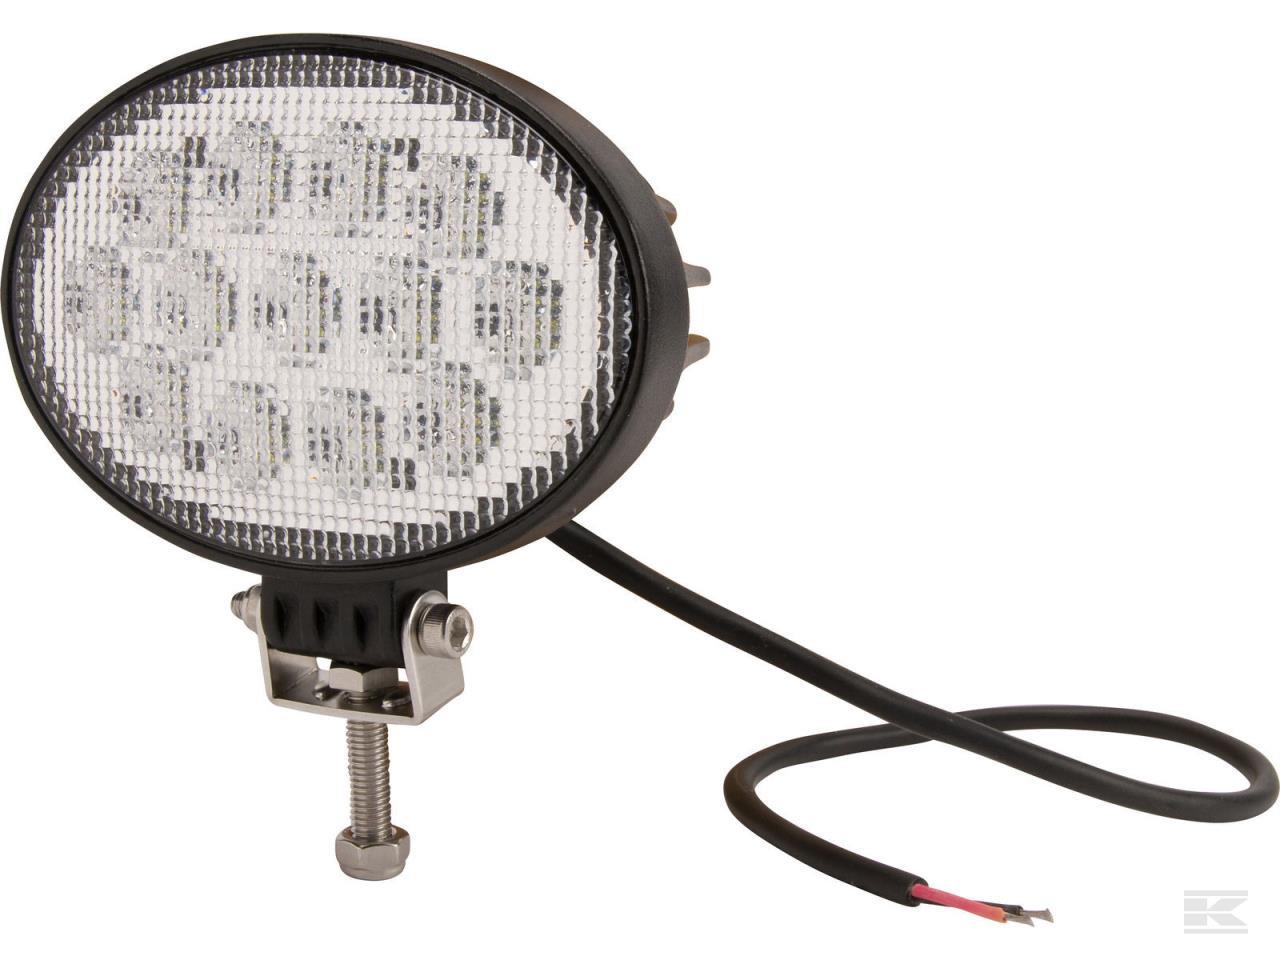 LED Arbejdslygte 3510 Lumen 39